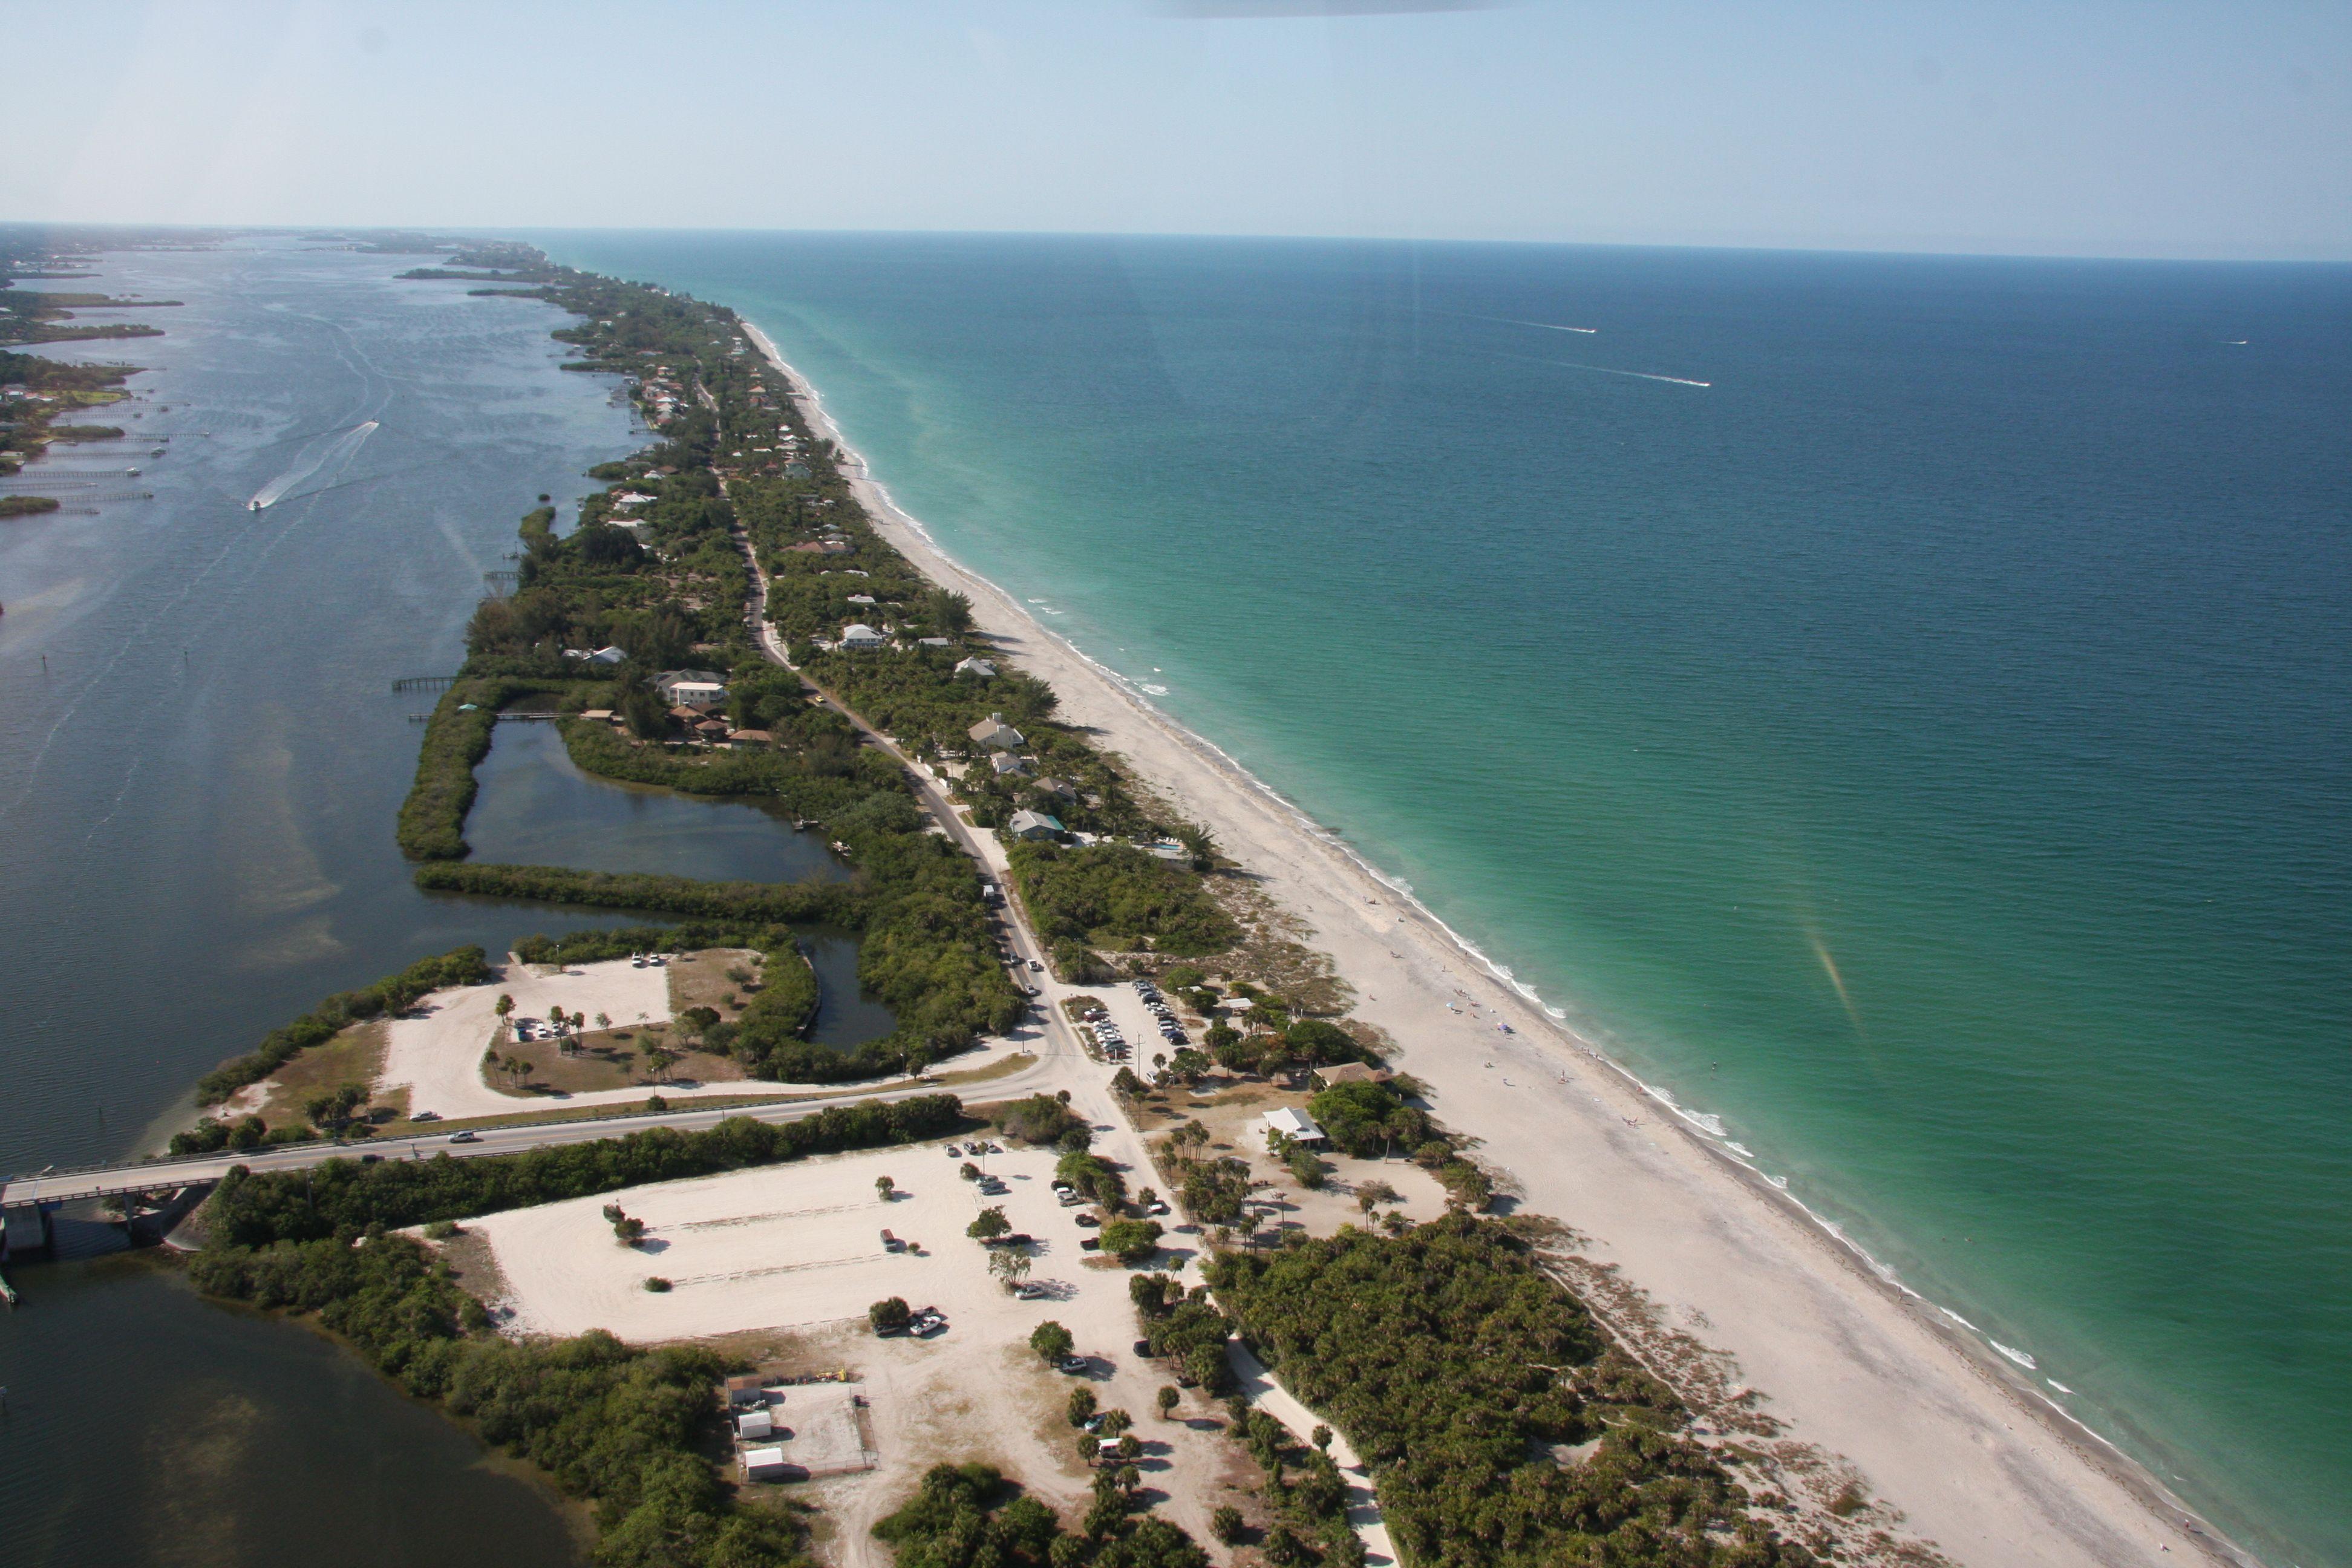 Manasota Key, Florida Where I spent my childhood summers ...